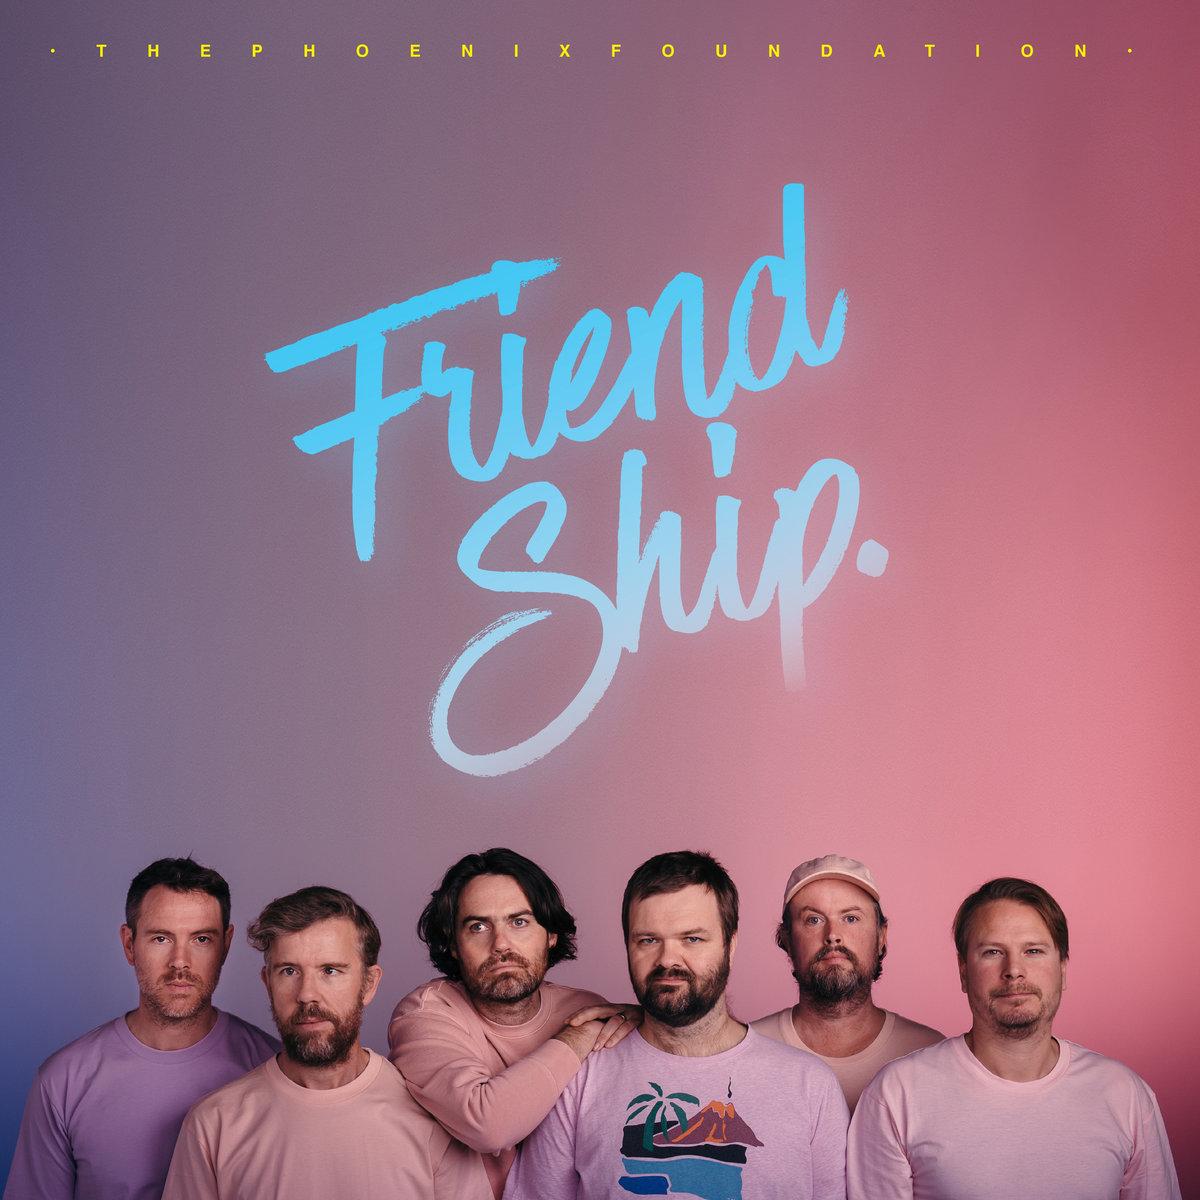 The Phoenix Foundation - Fiend Ship Album